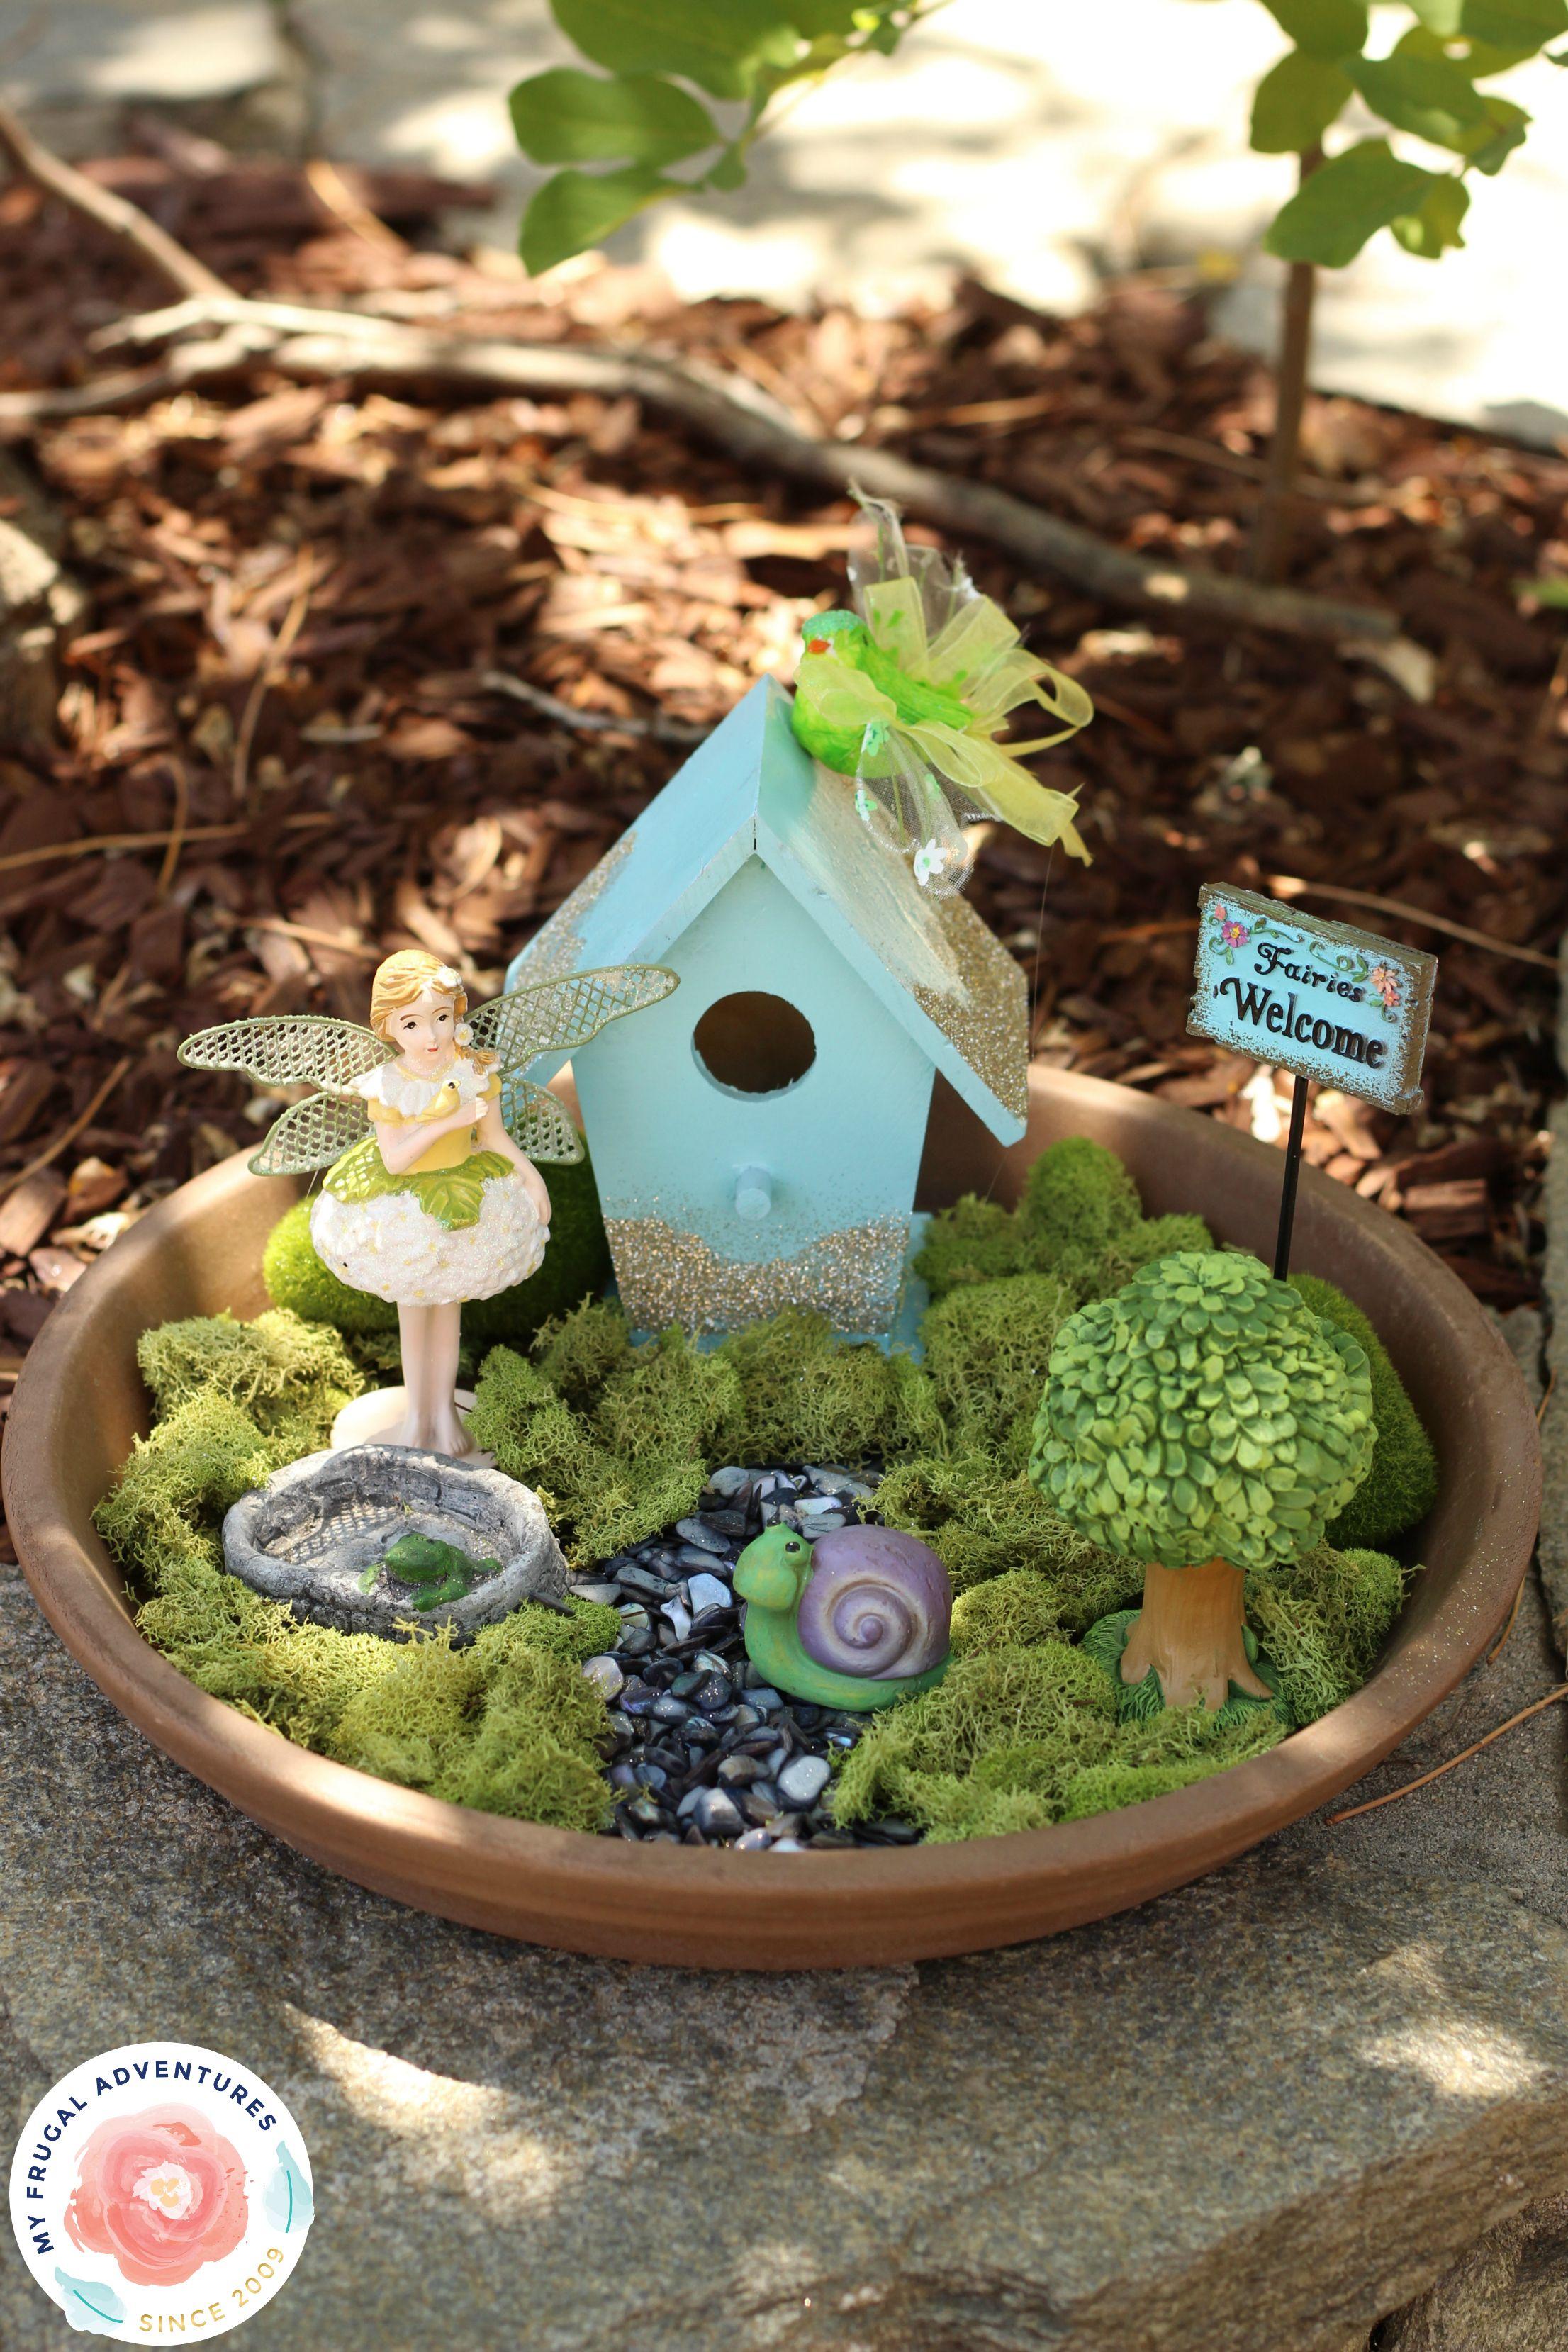 How To Make An Indoor Fairy Garden | MyCoffeepot Org